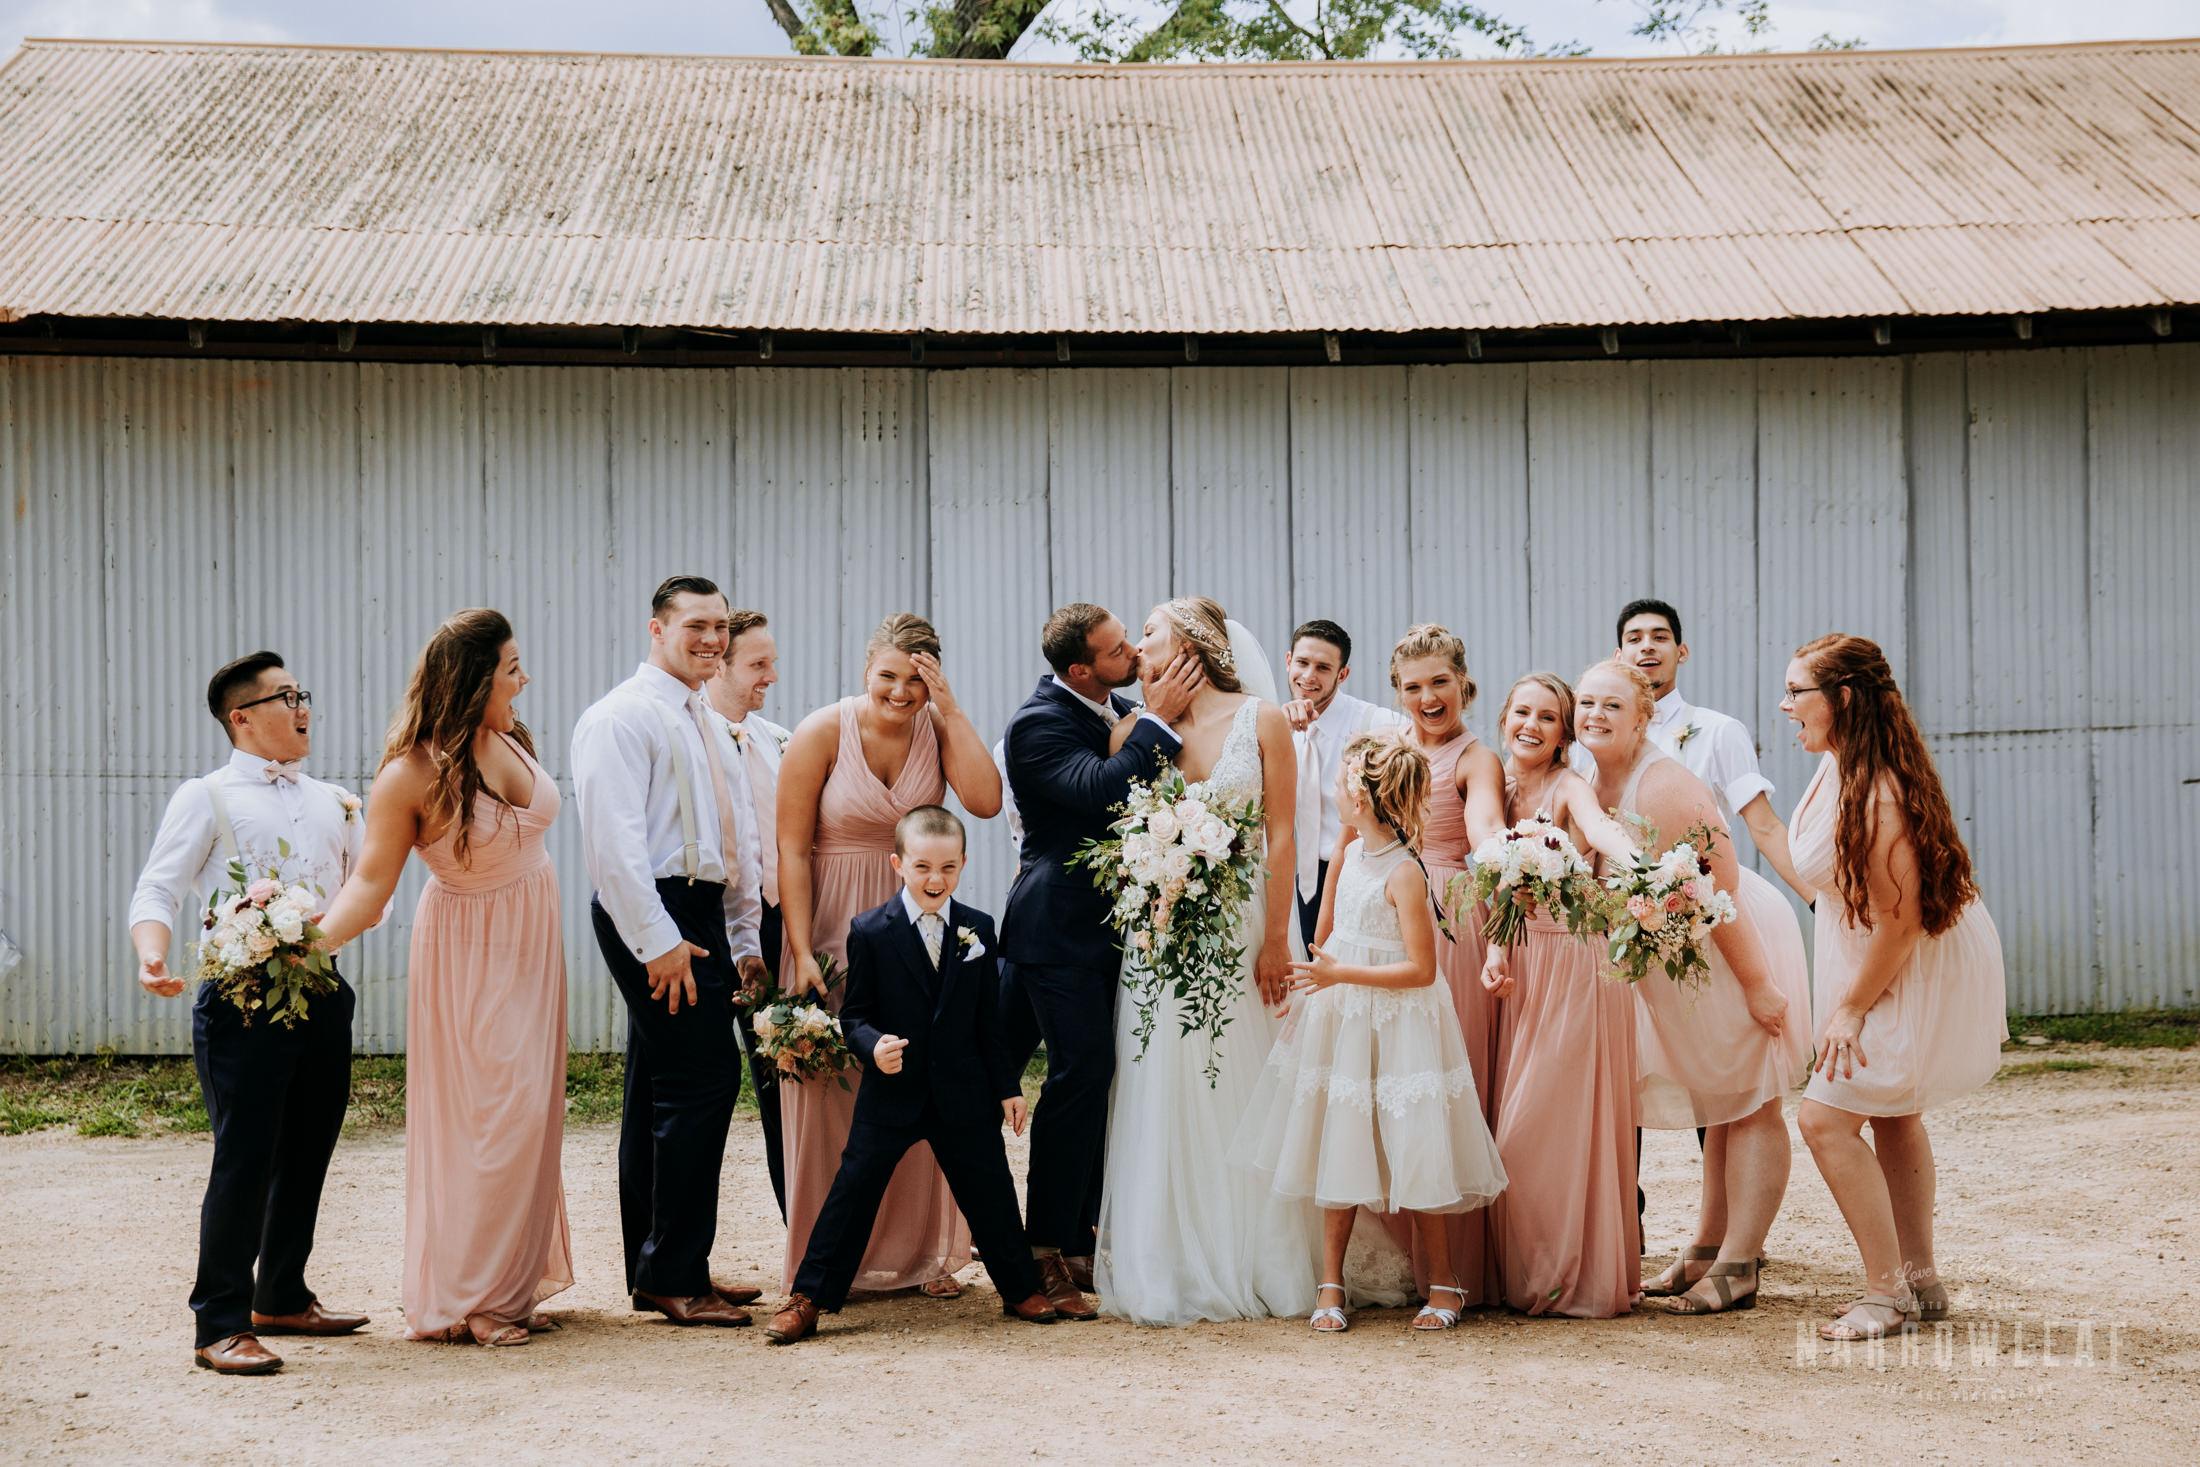 John-P-Furber-Farm-Minnesota-wedding-photographer-Narrowleaf_Love_and_Adventure_Photography-7395.jpg